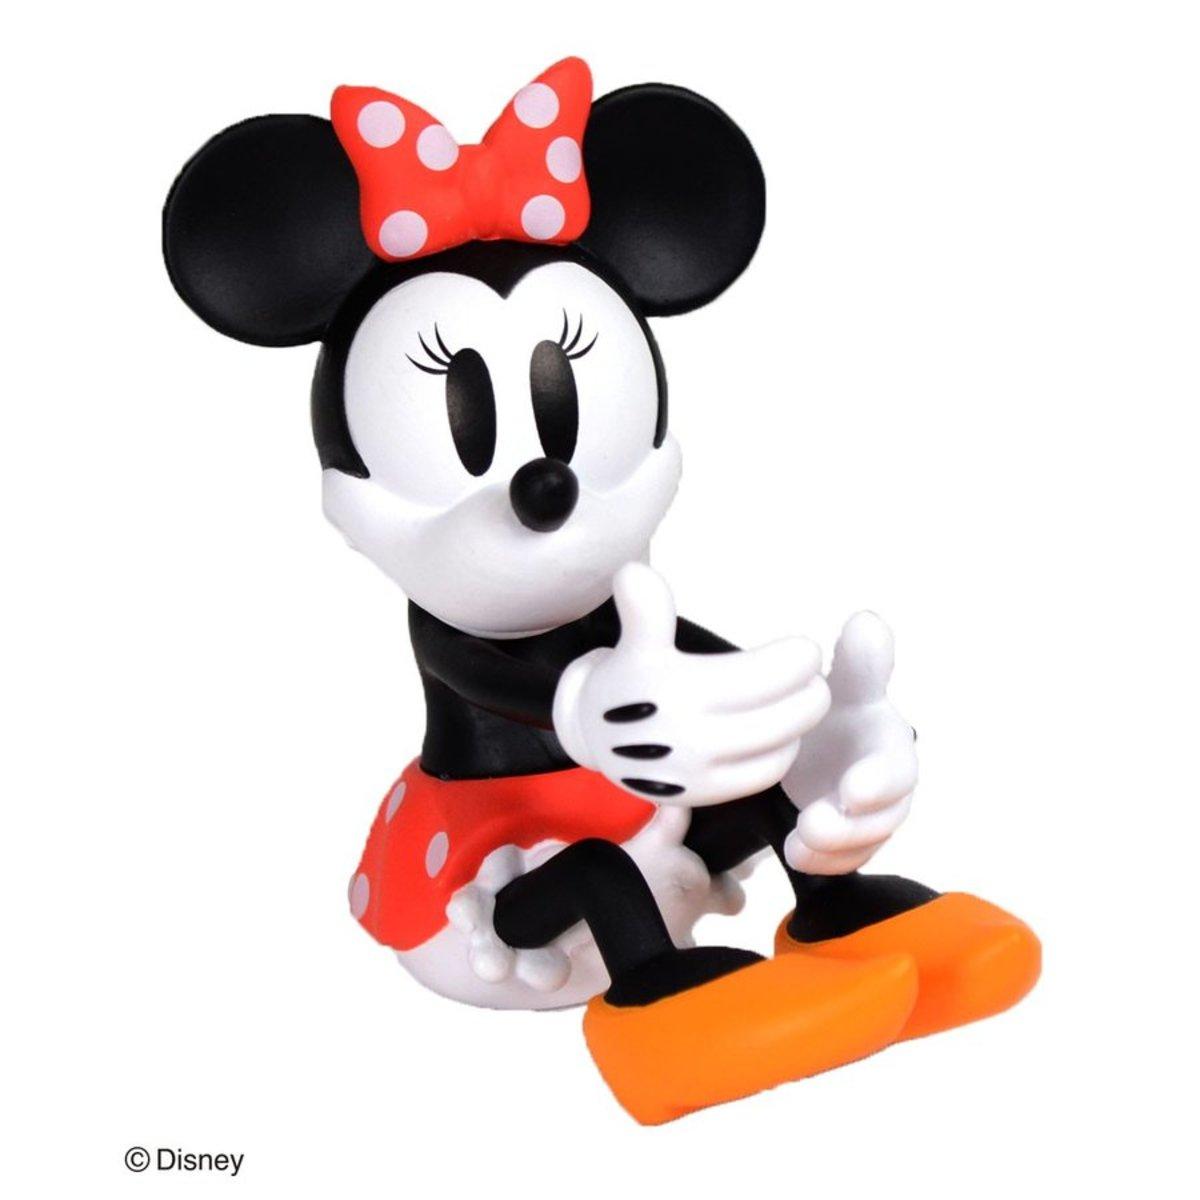 Disney Toothbrush holder Minnie 4992831142096